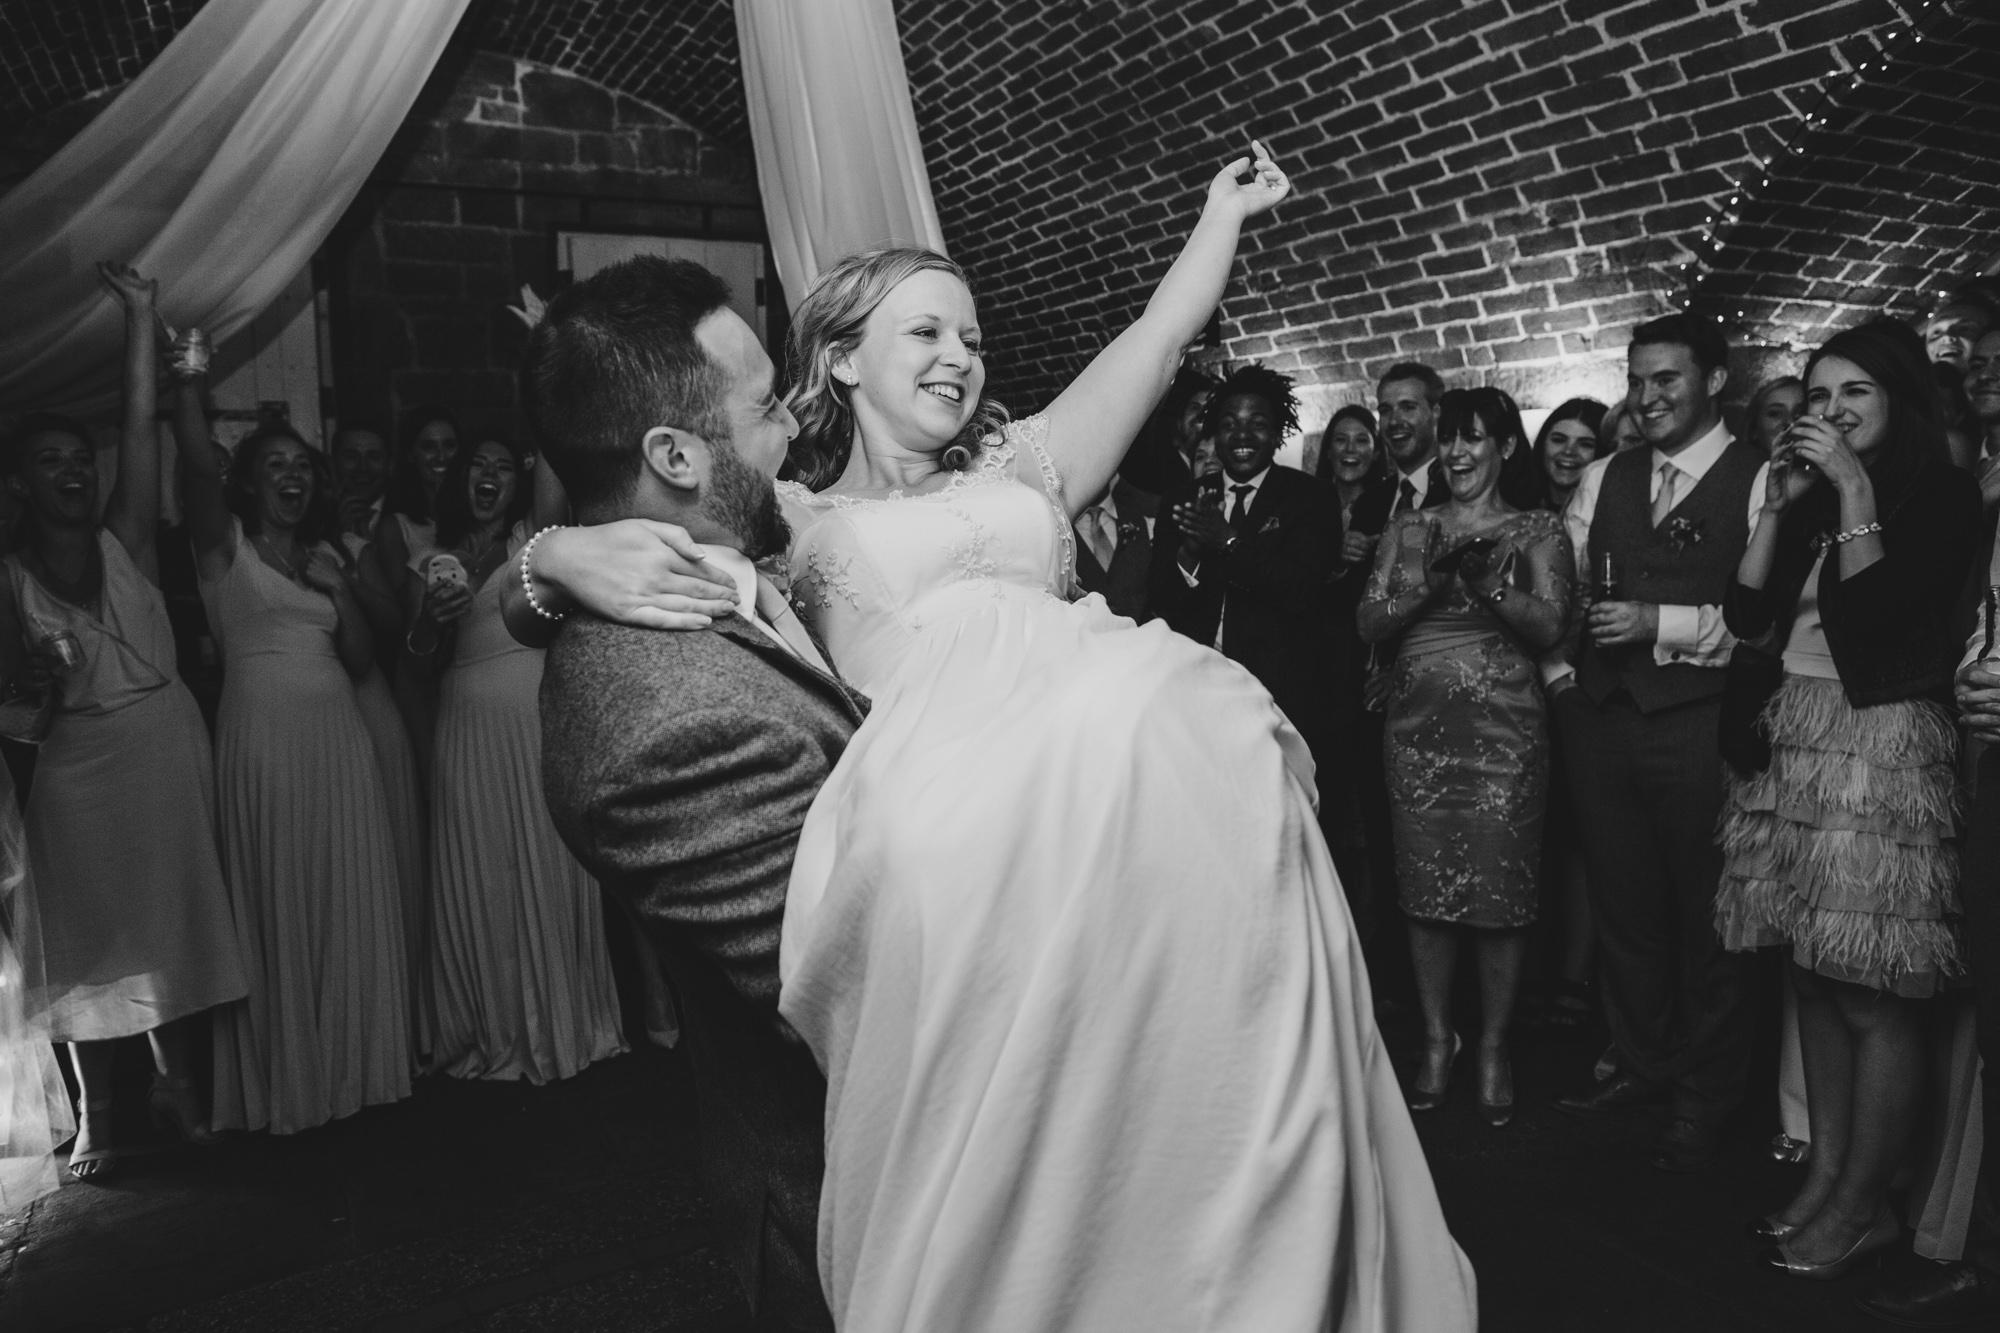 cornwall-alternative-wedding-photographer-beach-wedding-17.jpg